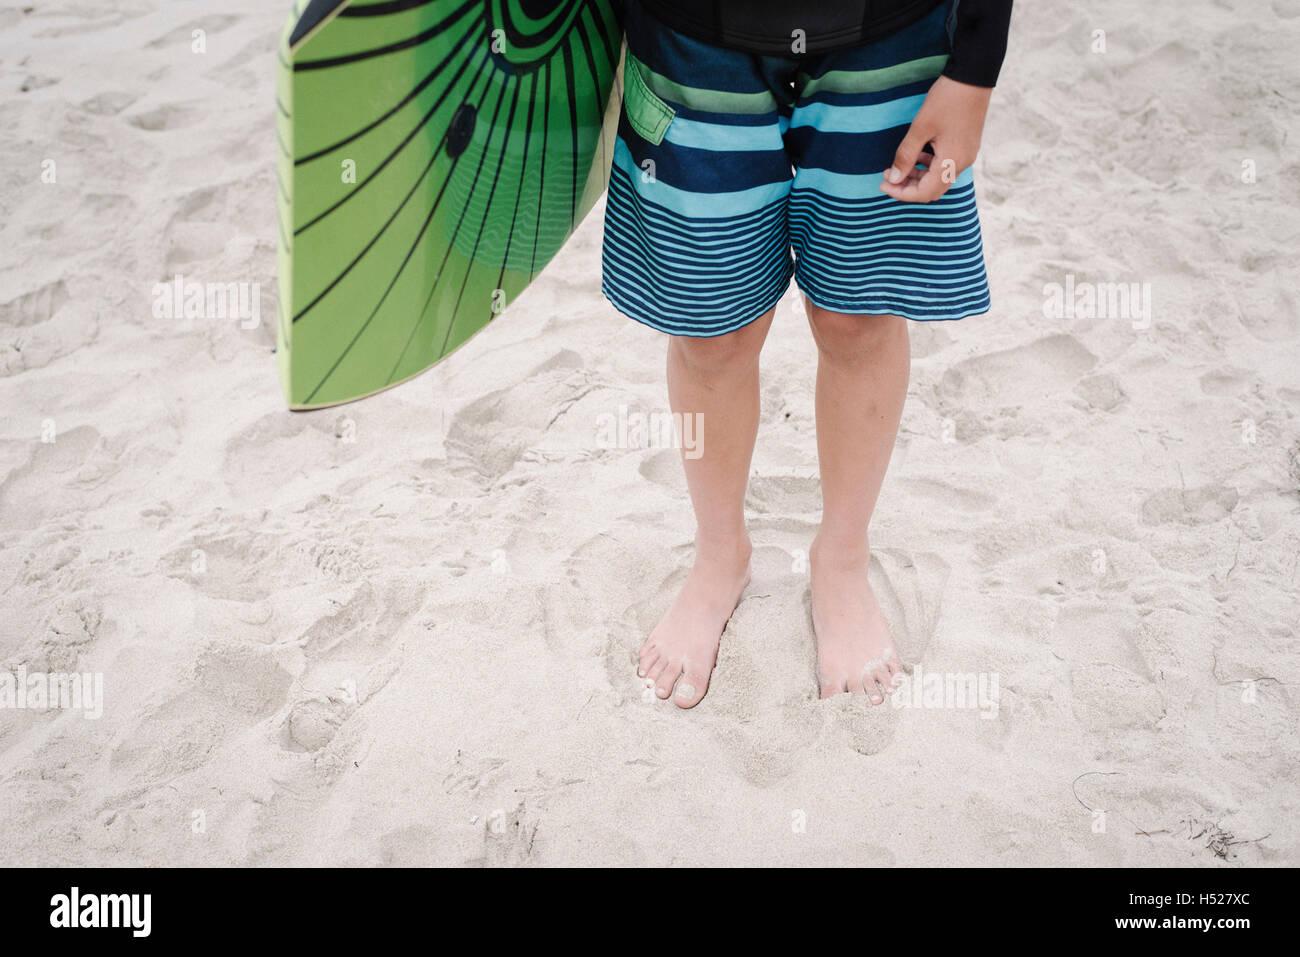 Boy on a sandy beach, wearing stripy blue swimming trunks, holding a bodyboard. - Stock Image